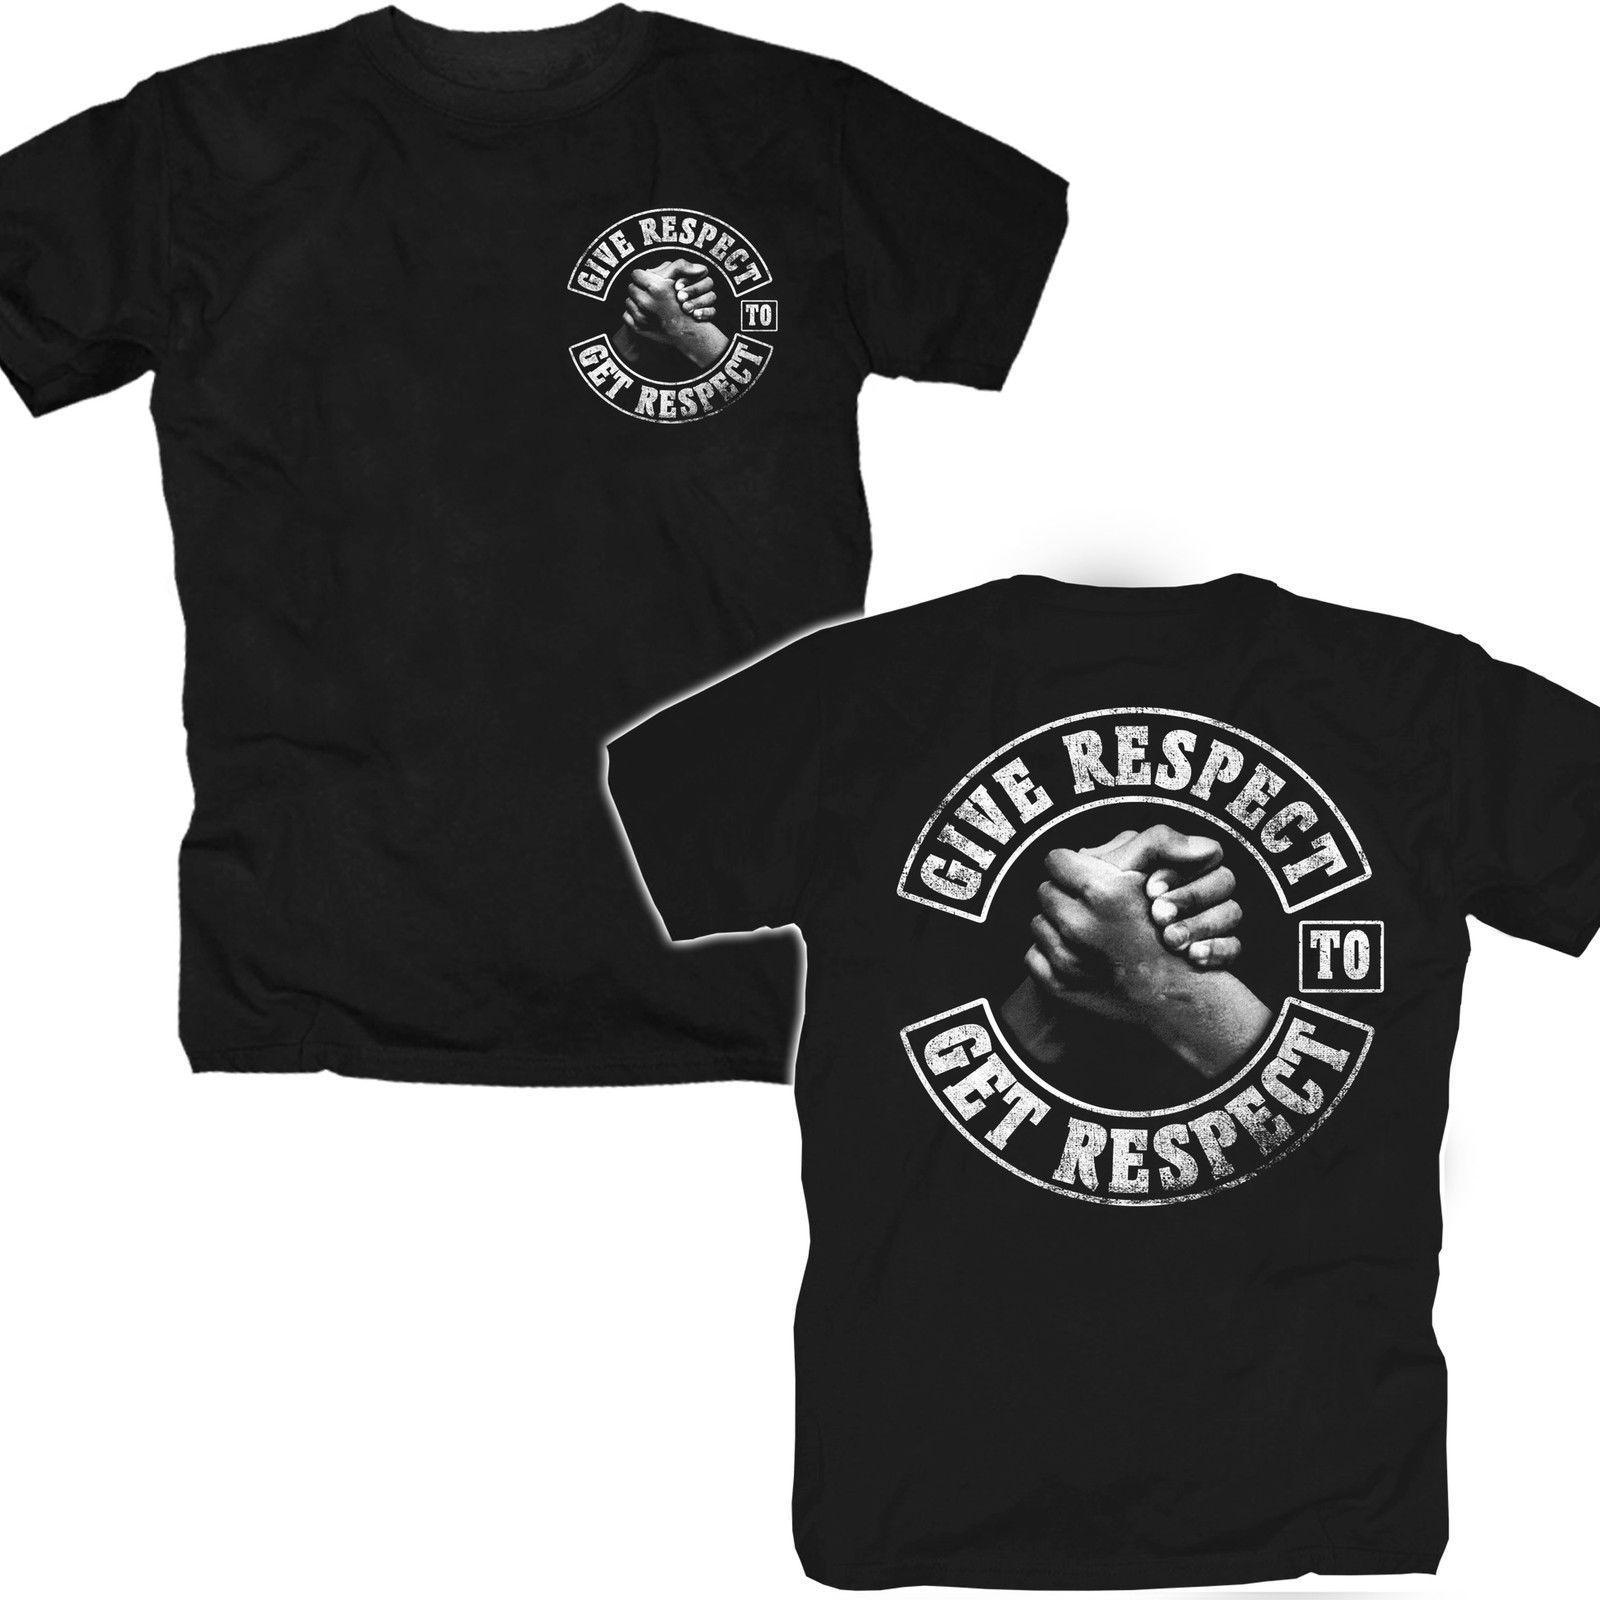 Camiseta Camiseta Respeto Brotherhood Outlaw Biker Chopper Tattoo Mc Coast Rocker T-shirt Tops Verano Cool Funny T